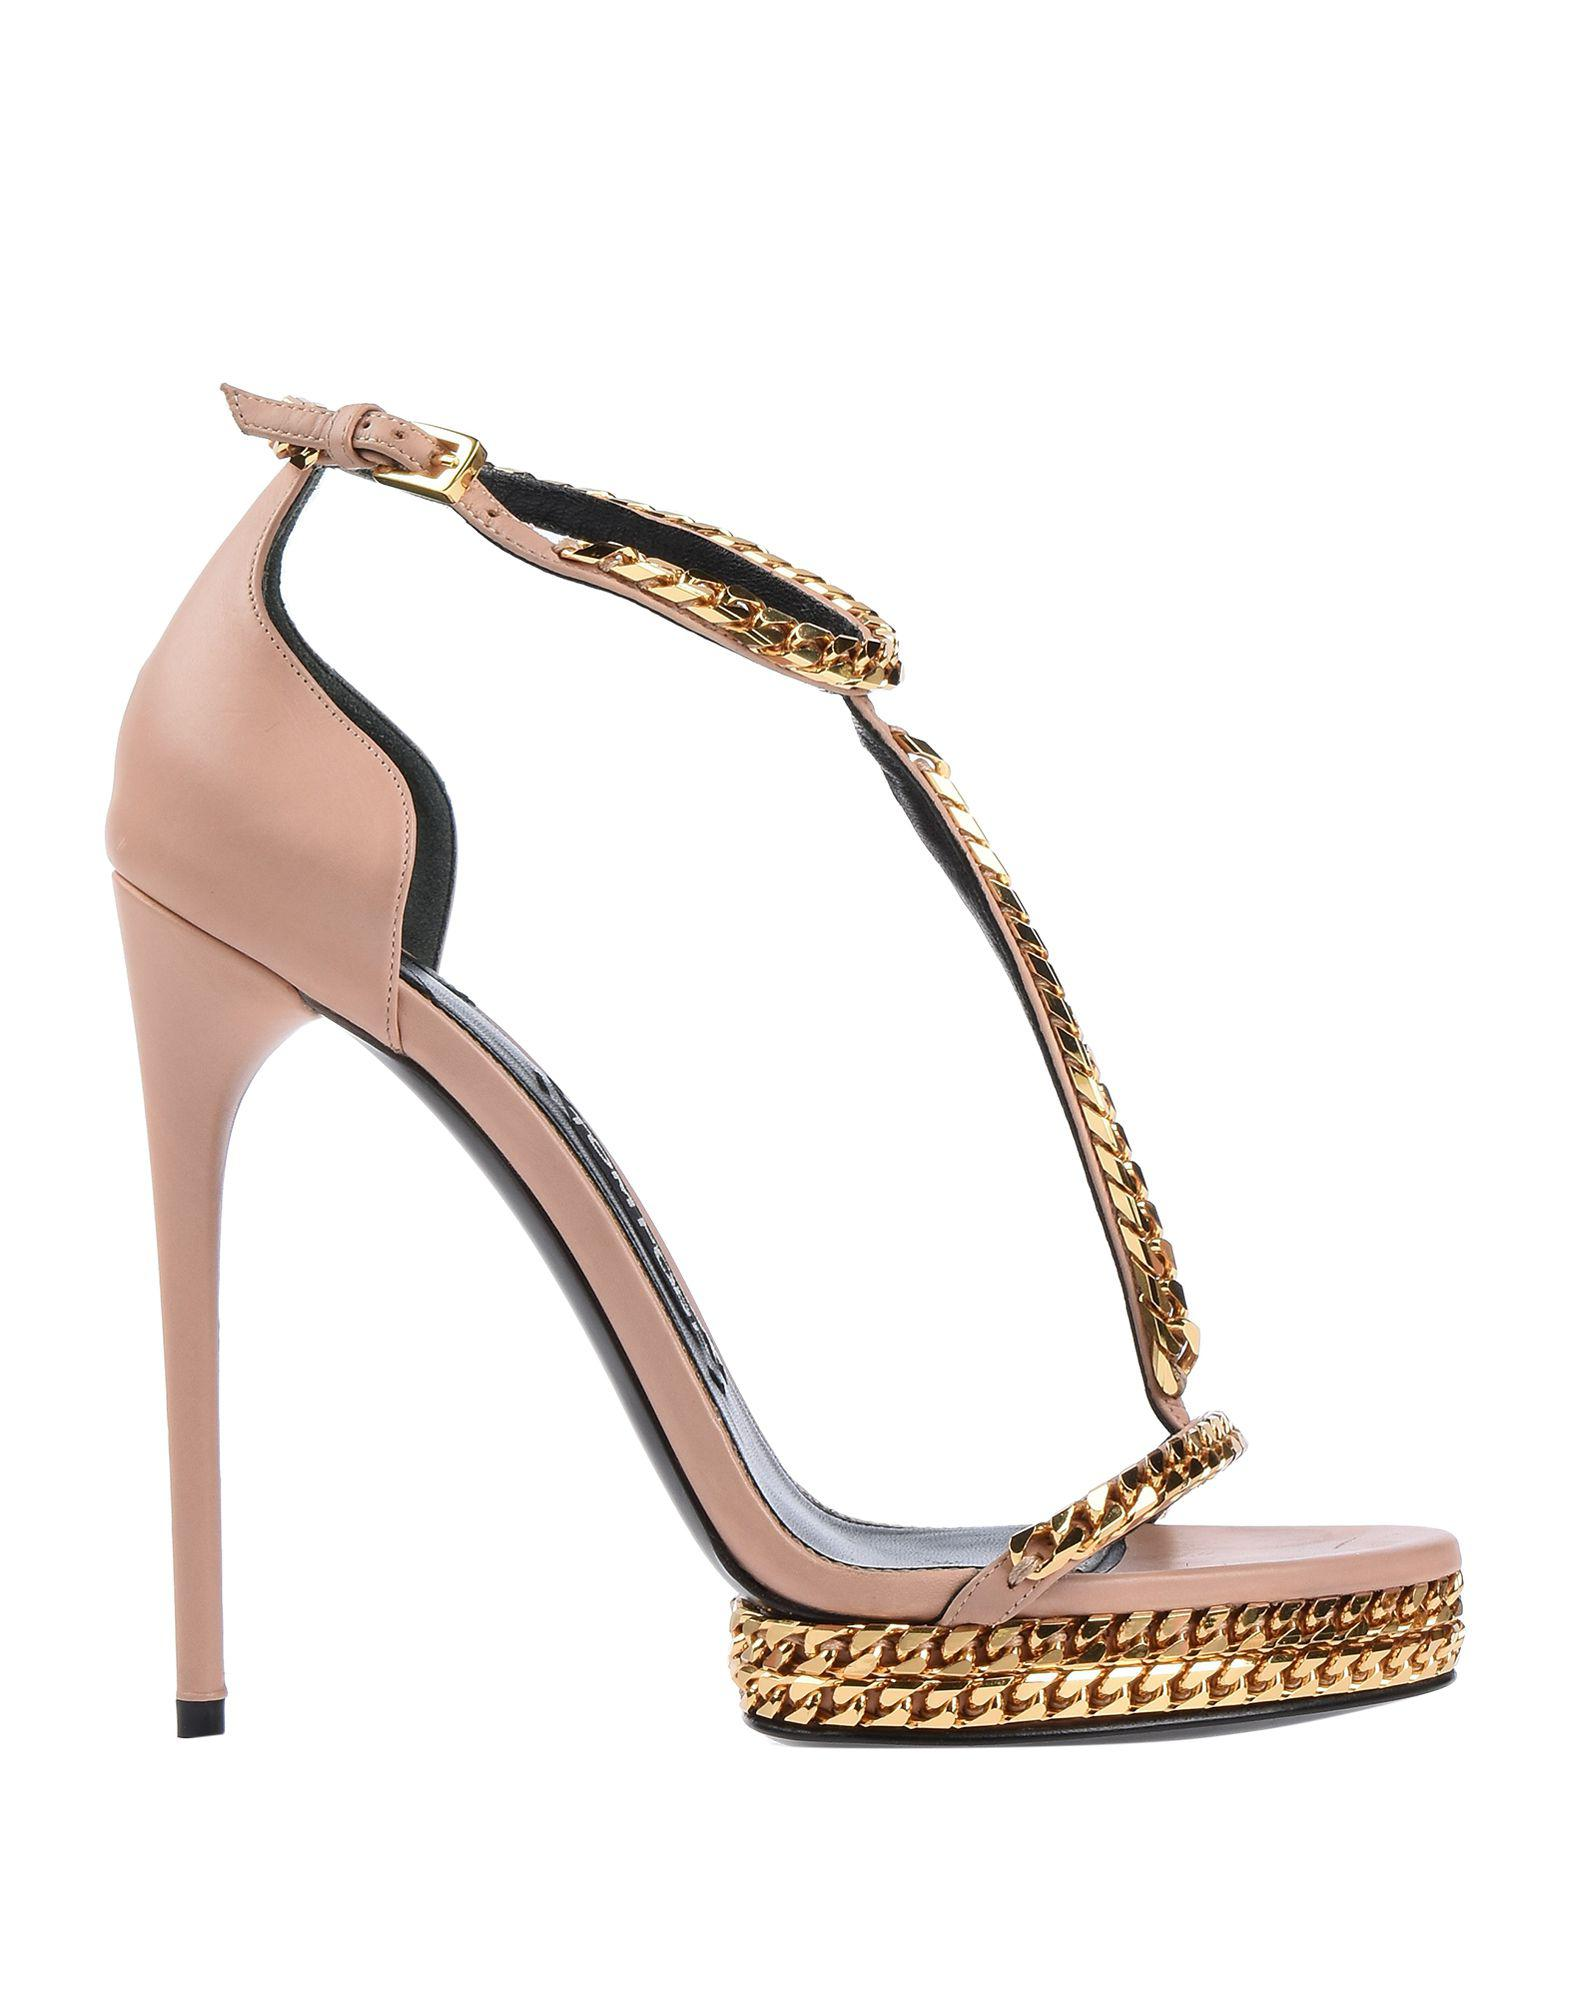 9fca81cf1e7 Tom Ford. Women s Sandals